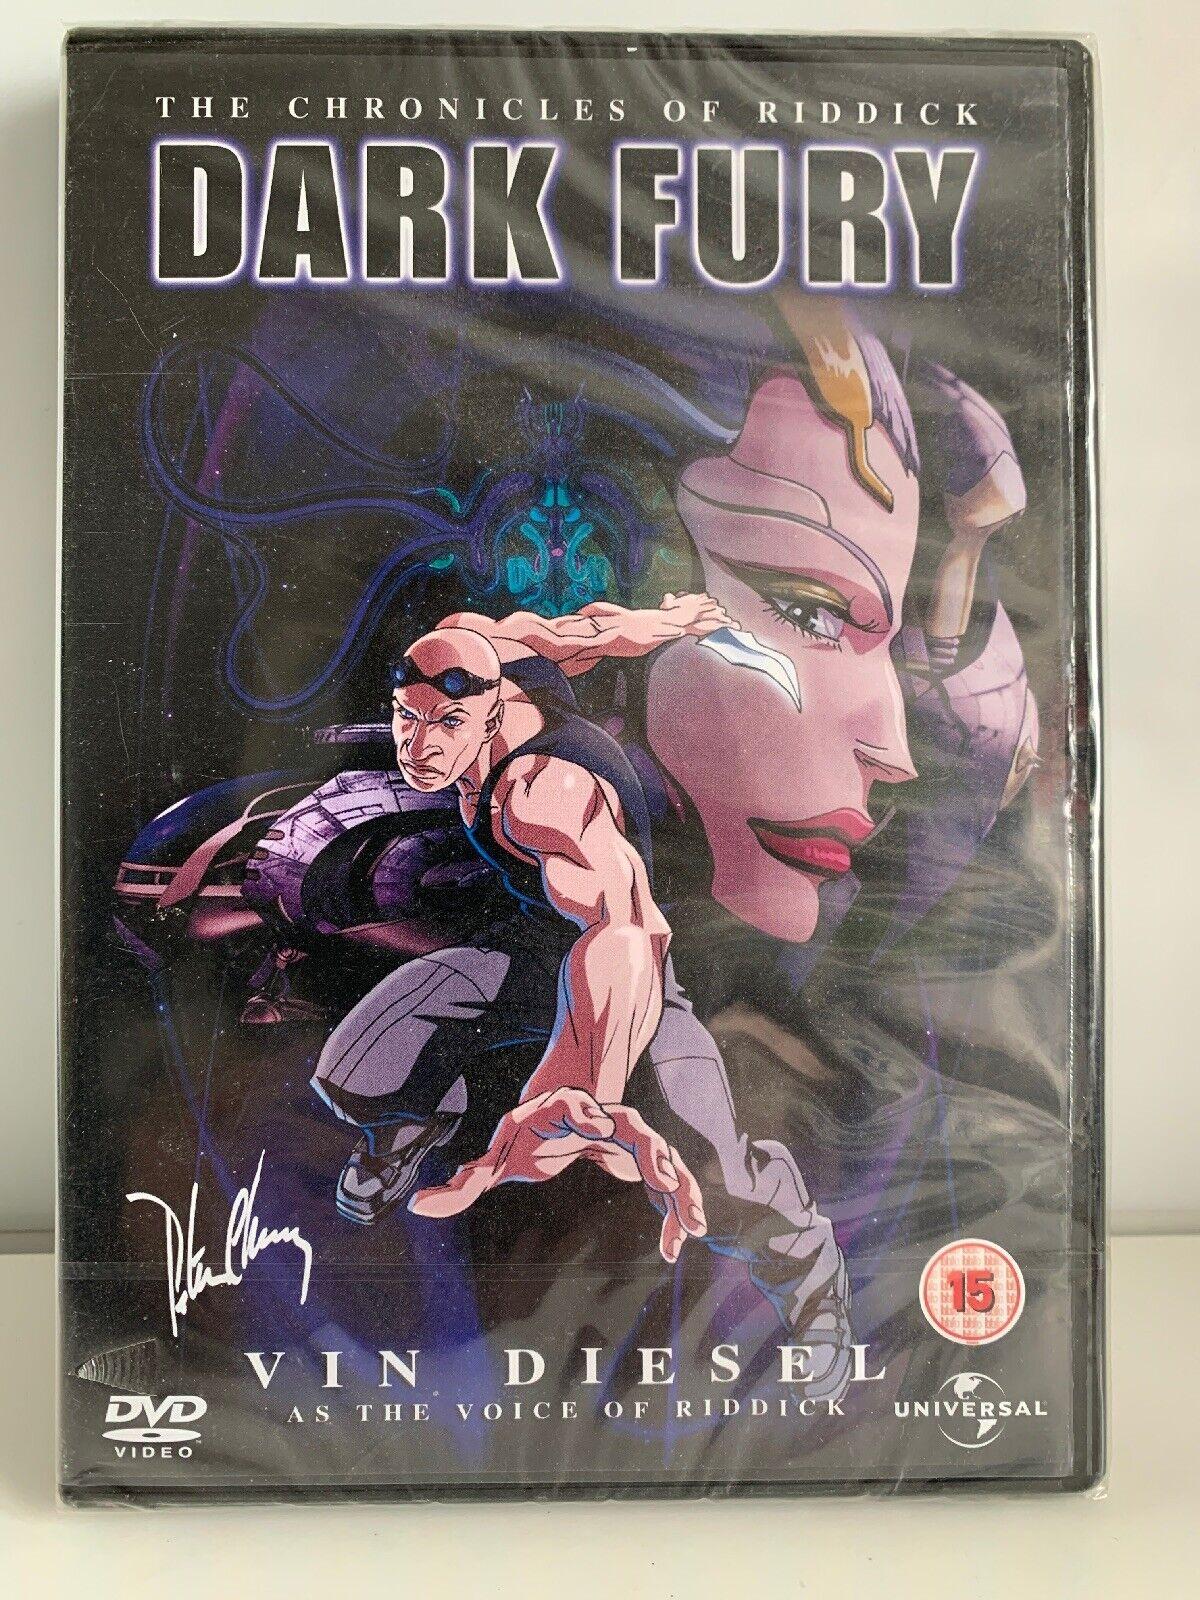 The Chronicles Of Riddick - Dark Fury (DVD, 2007) for sale online